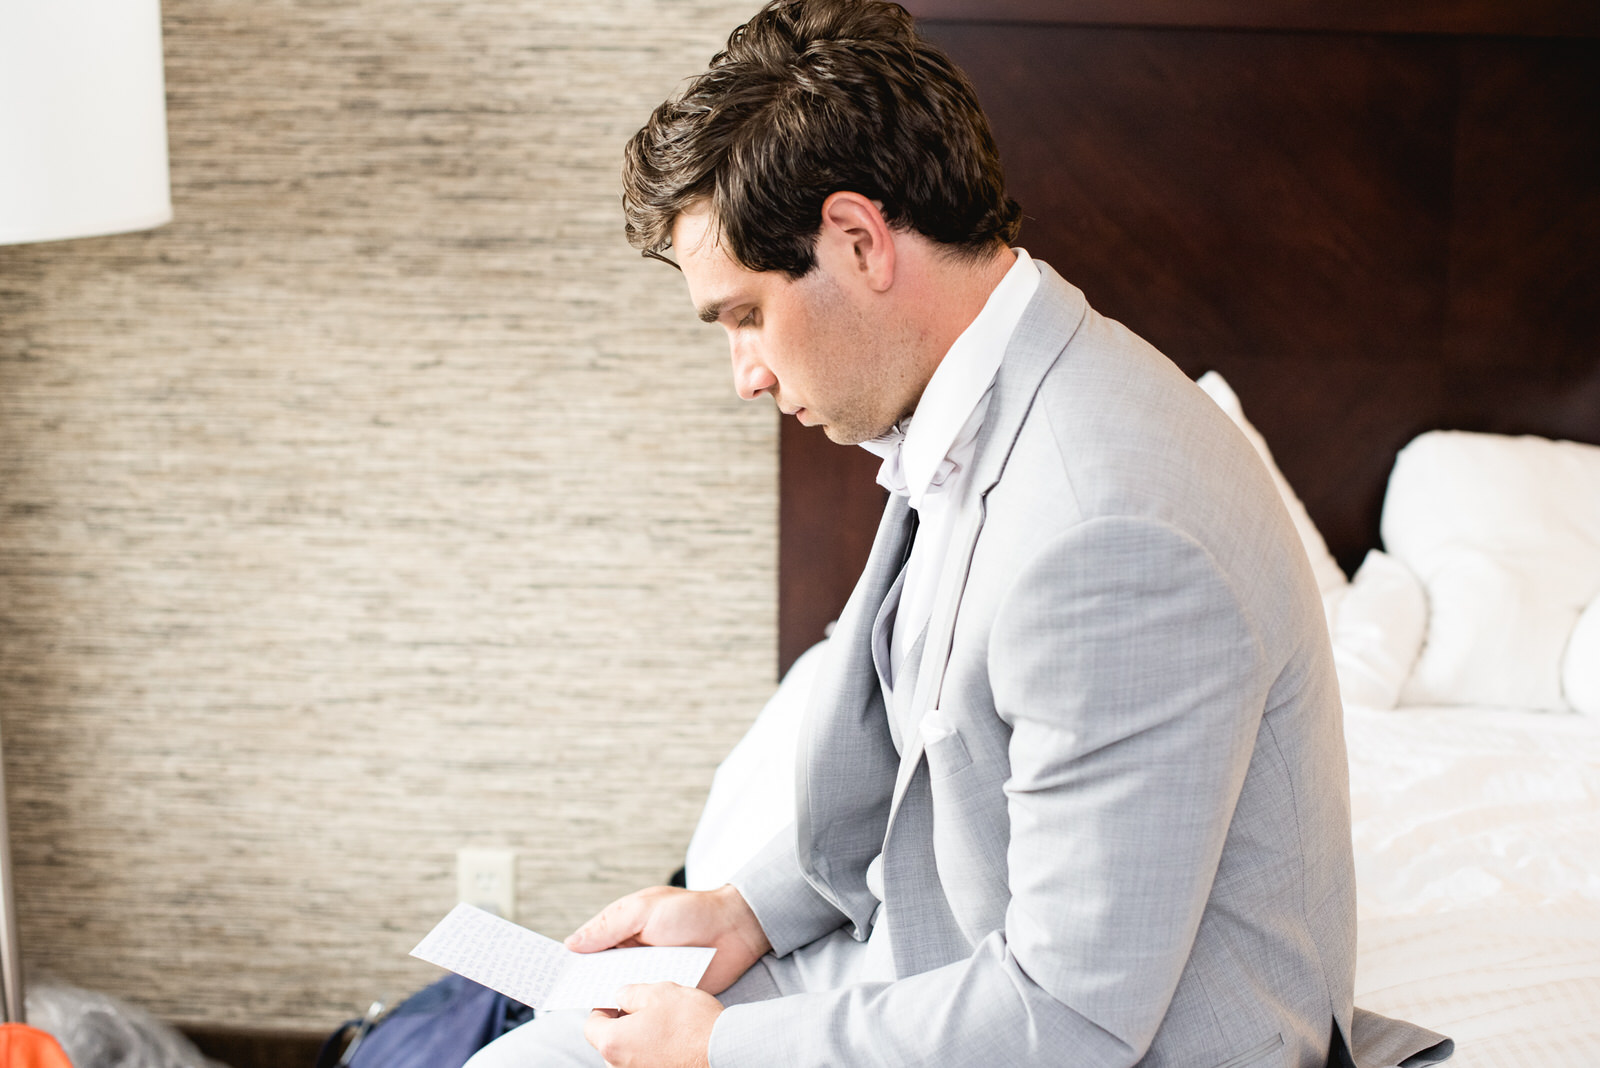 Groom reading note in hotel